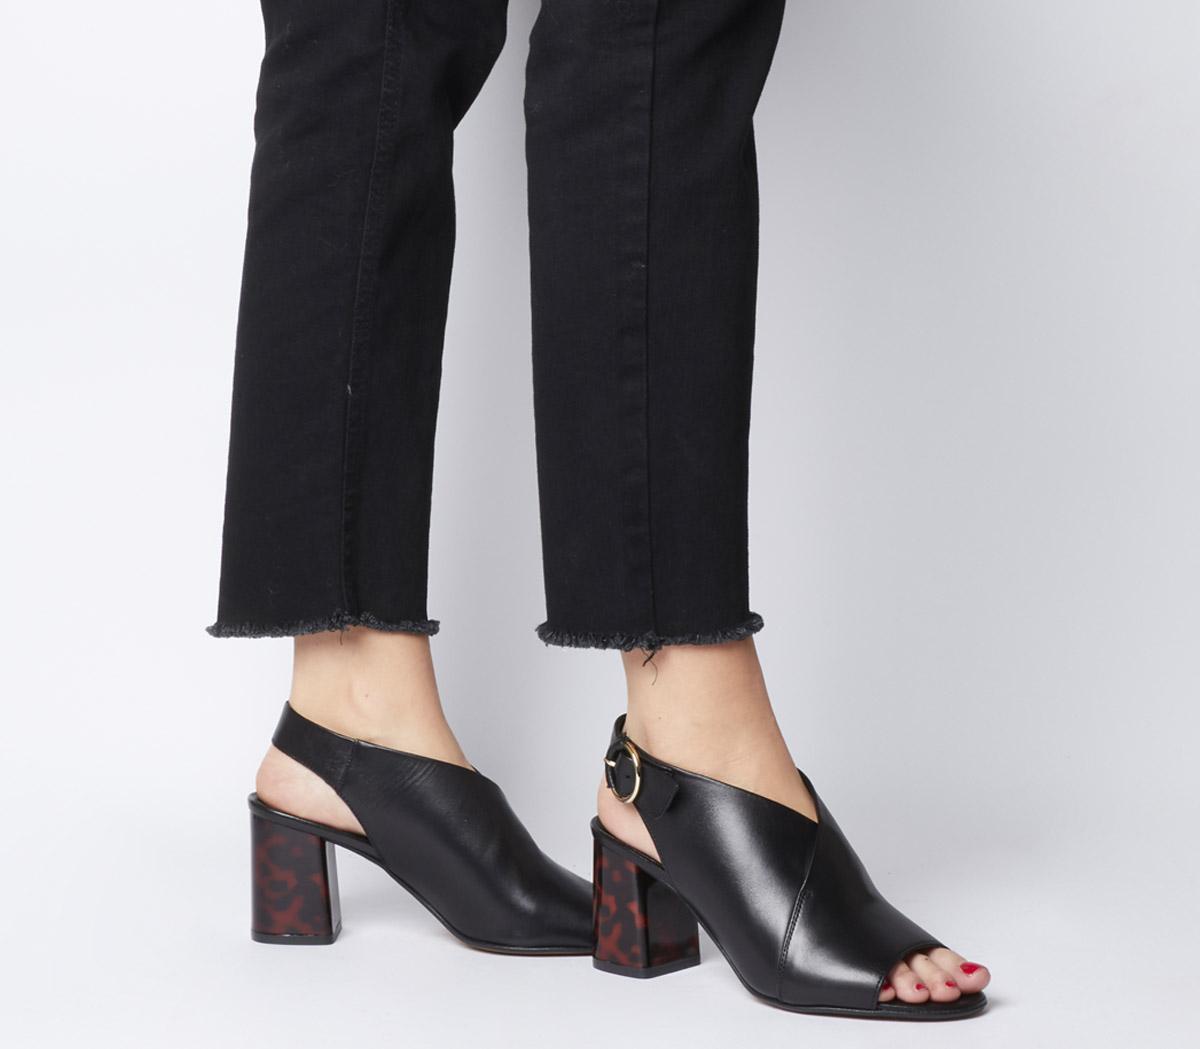 Madora Feature Heel Shoe Boots